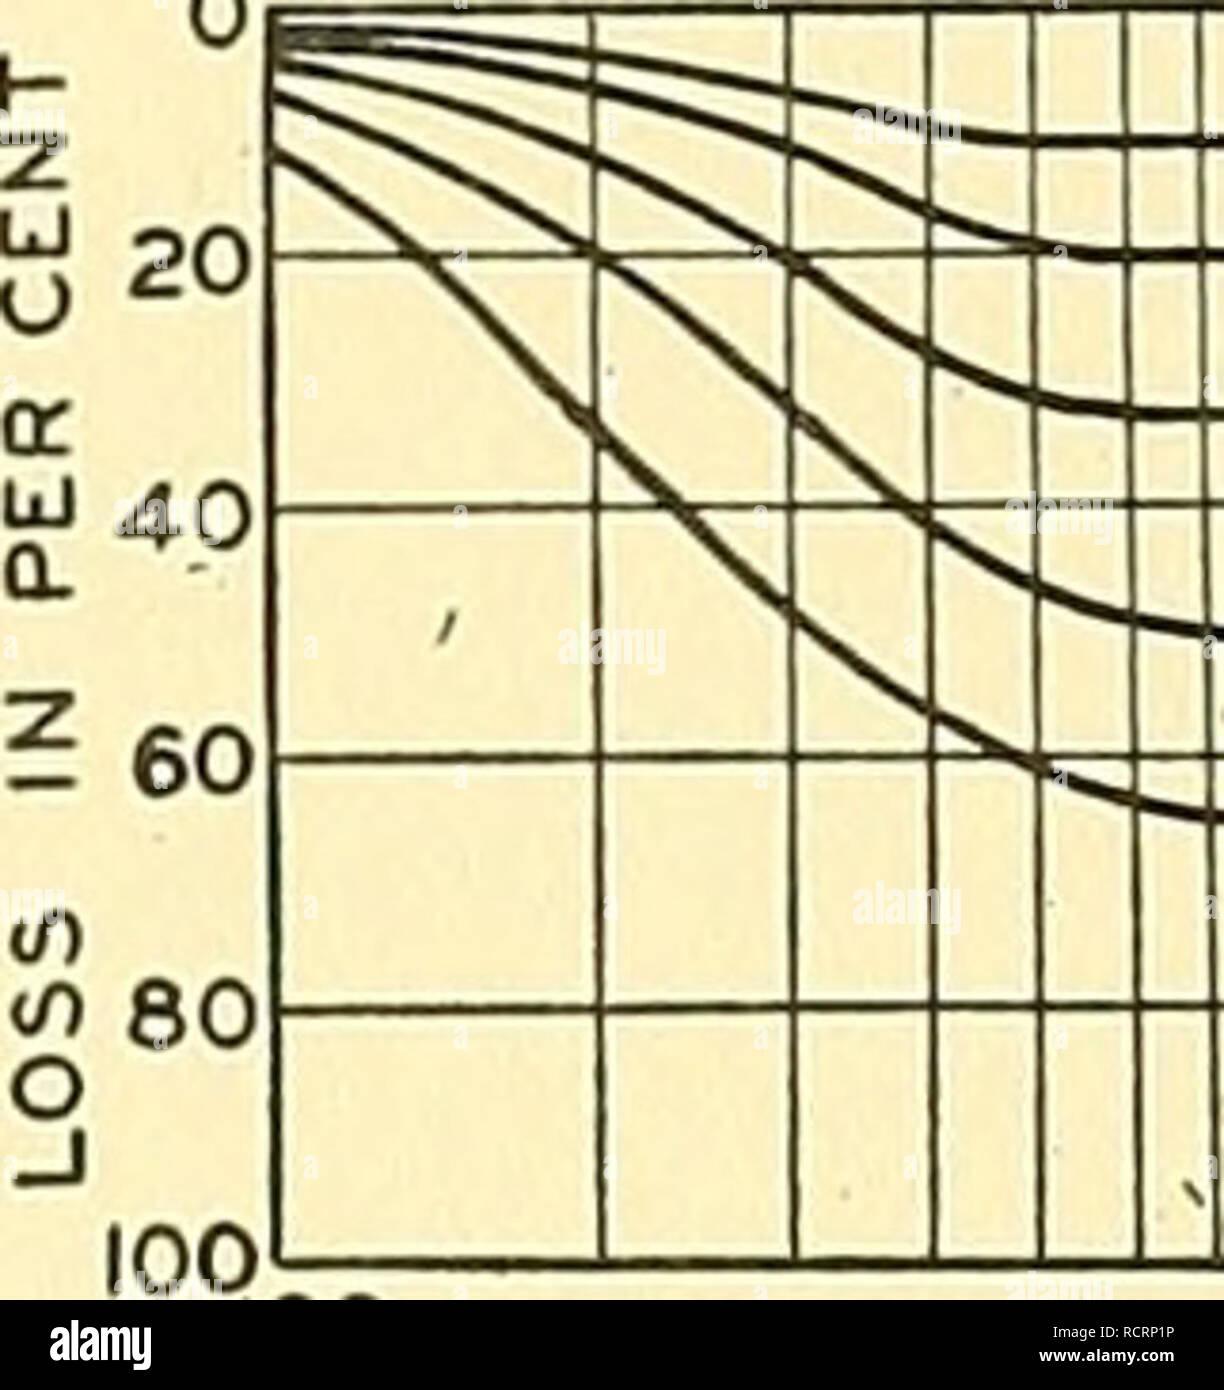 Elements of acoustical engineering  Electro-acoustics